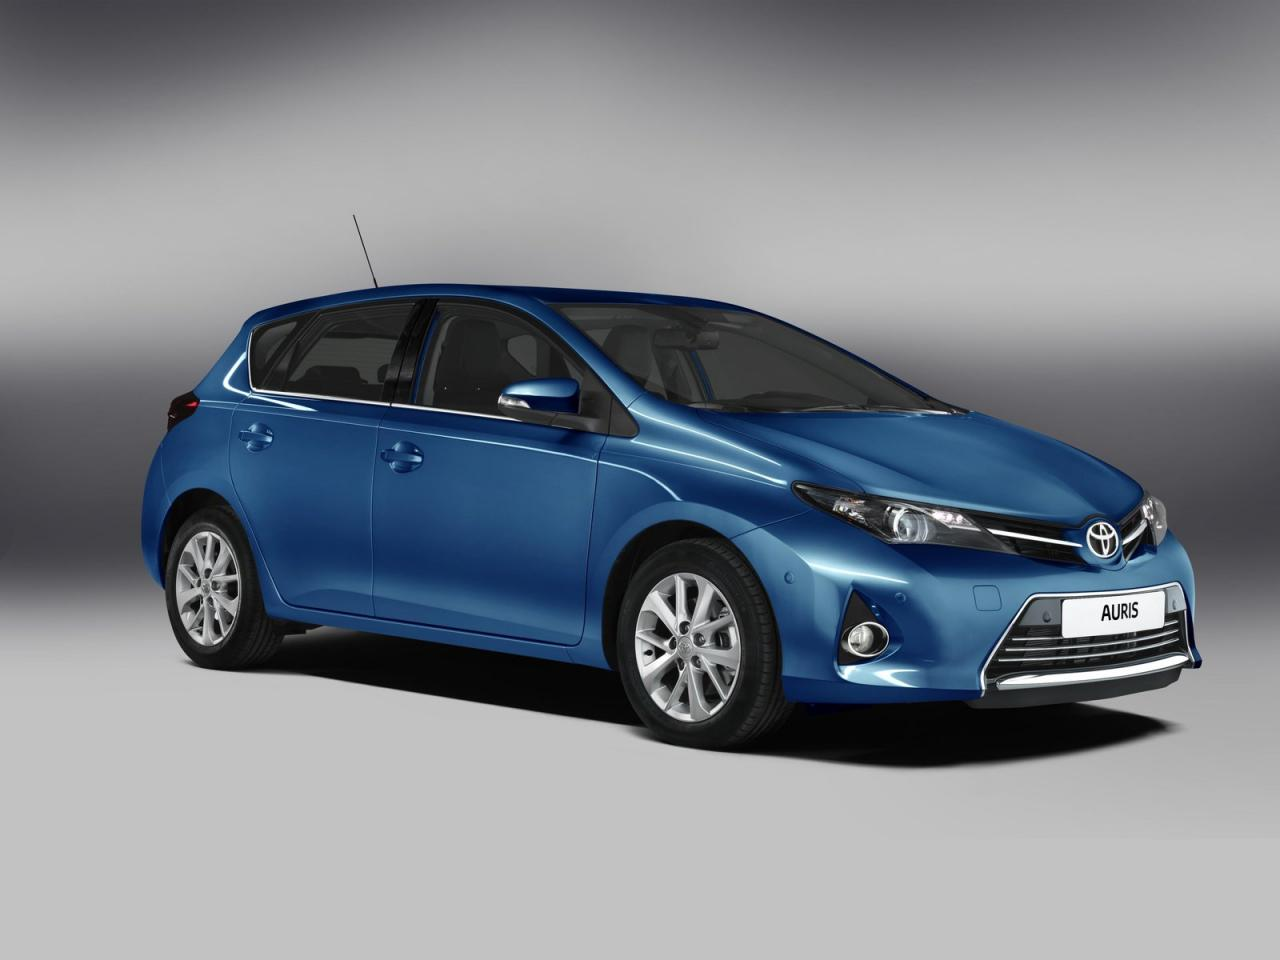 [Resim: Toyota+Auris+1.jpg]